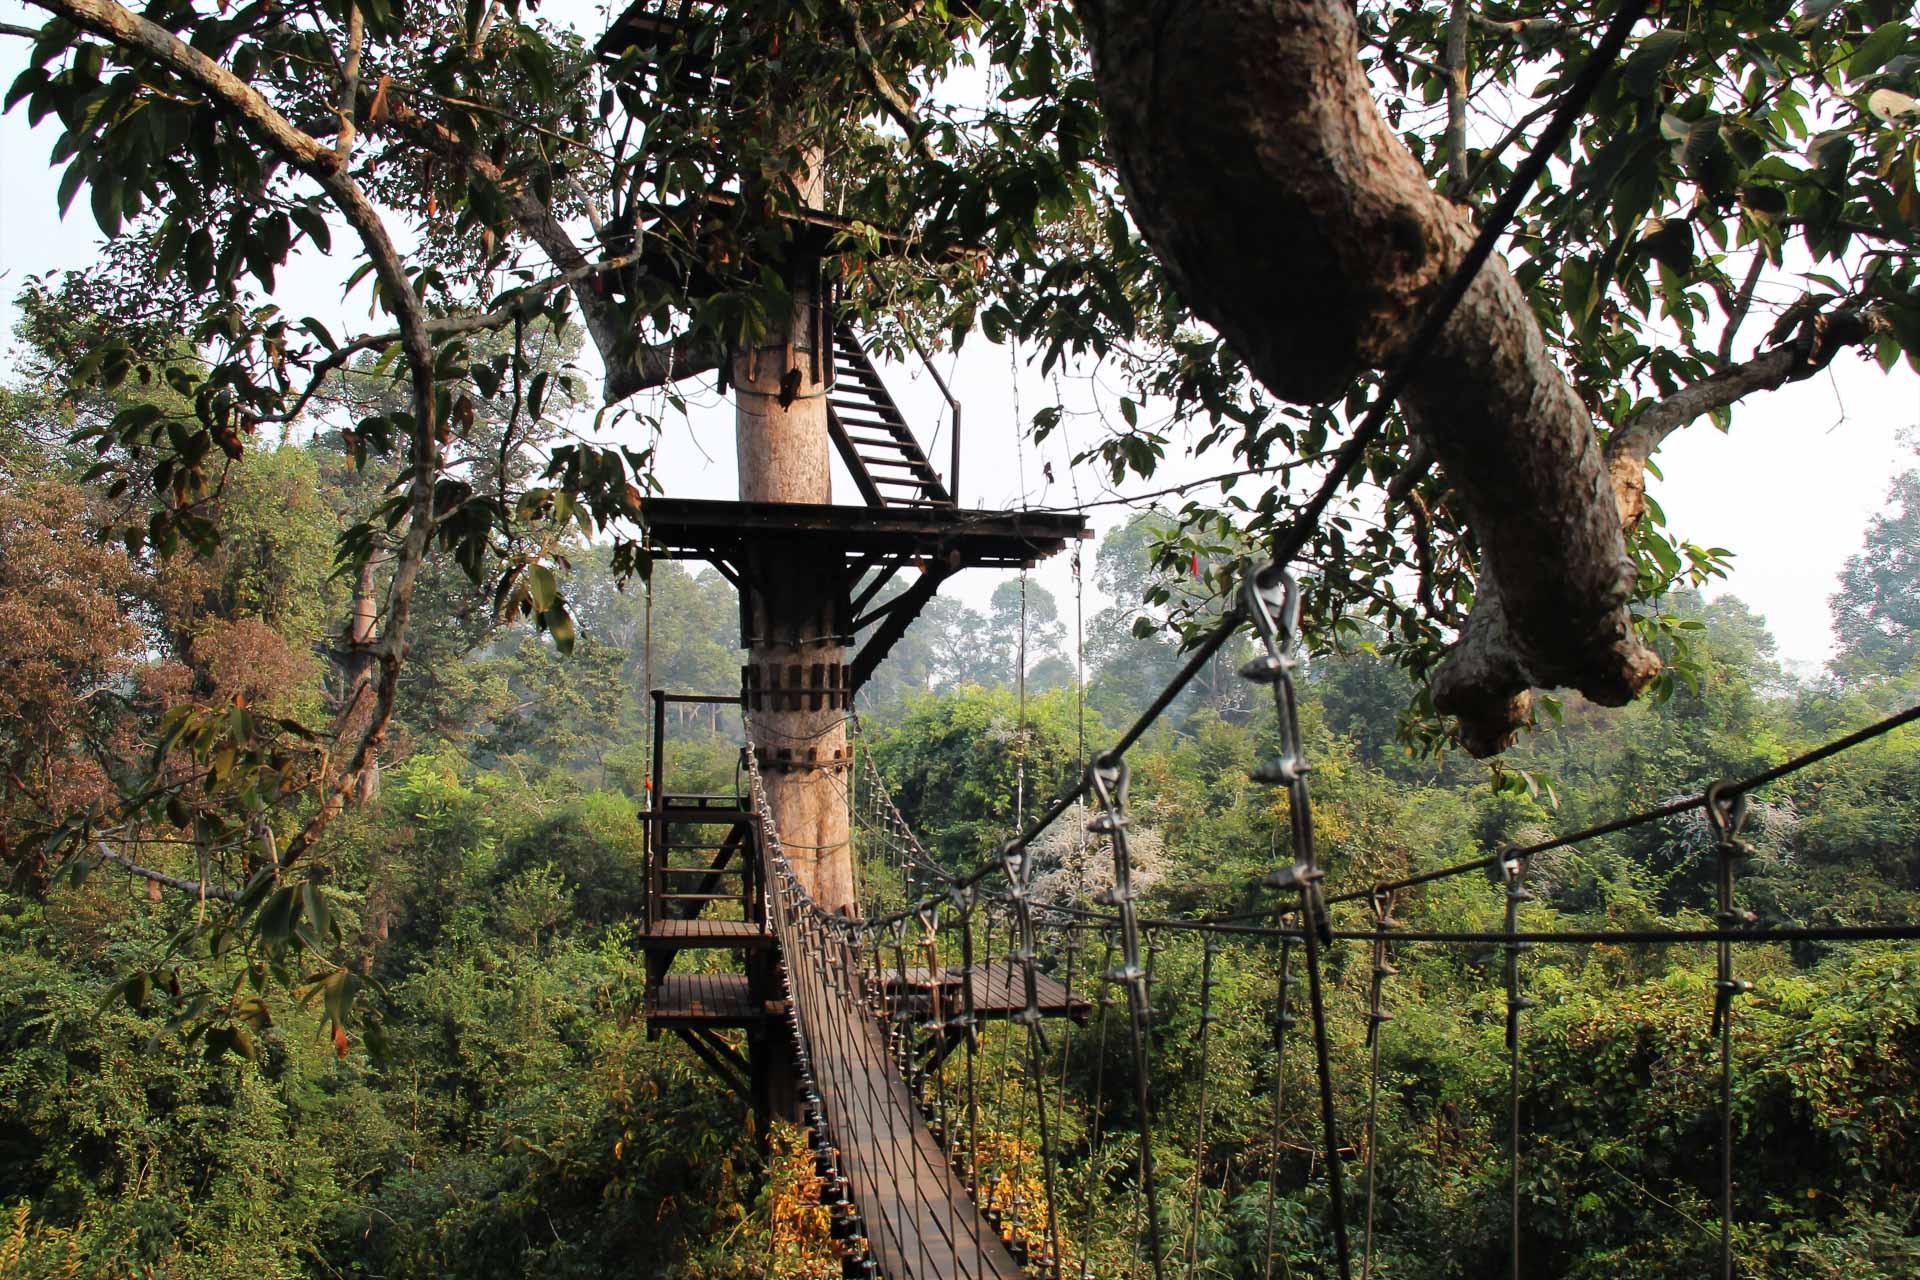 Lesvoyageuses-teste-par-les-voyageuses-tyrolienne-siem-reap-cambodge-angkor-zipline-2